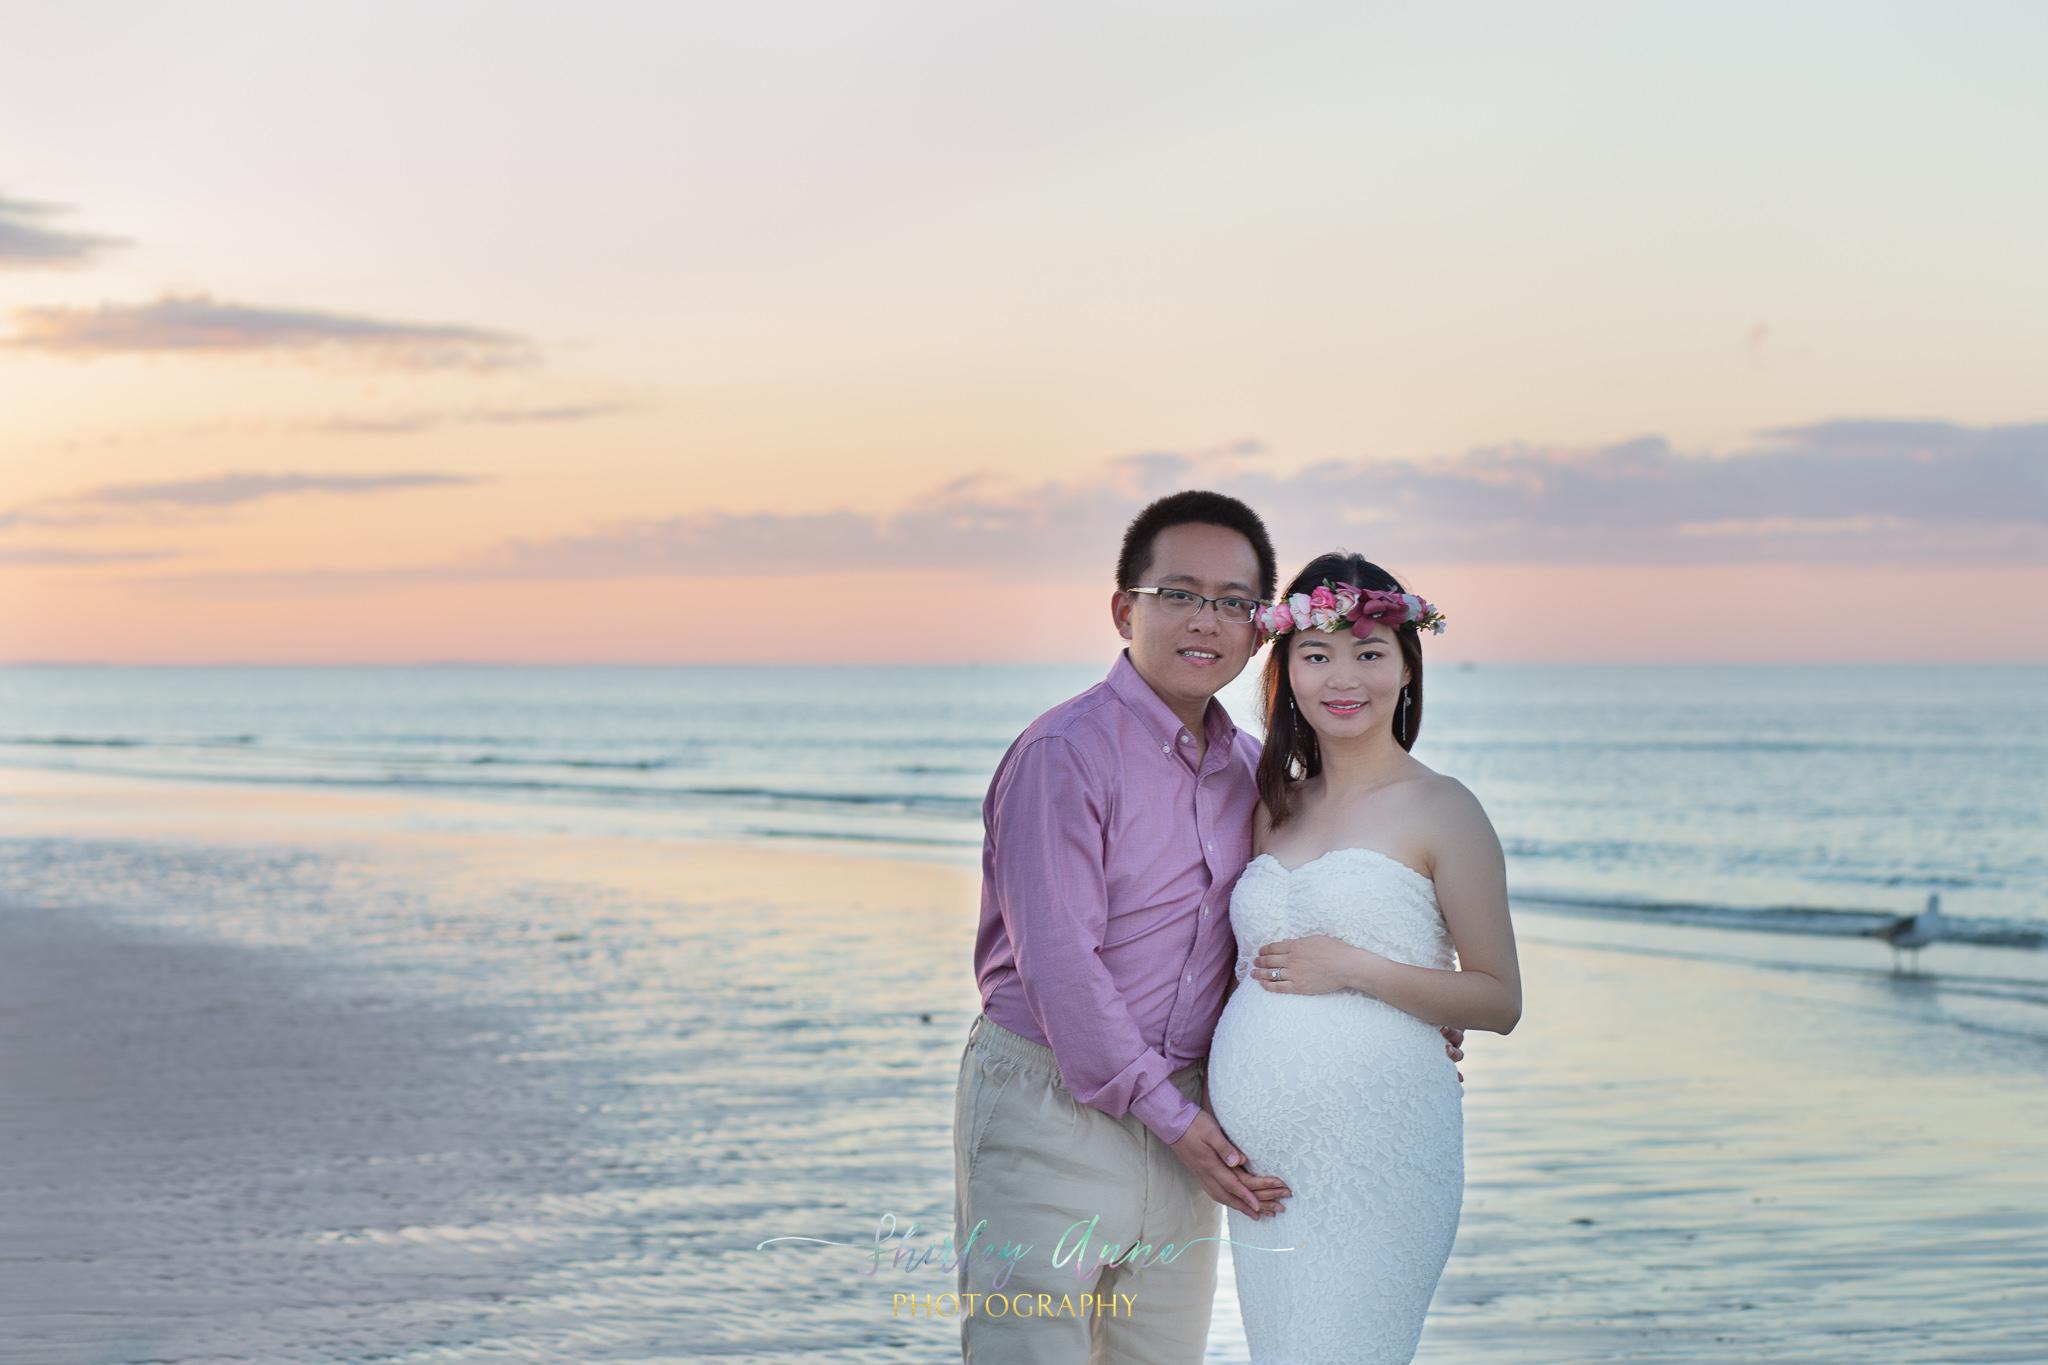 waltham ma maternity photographer